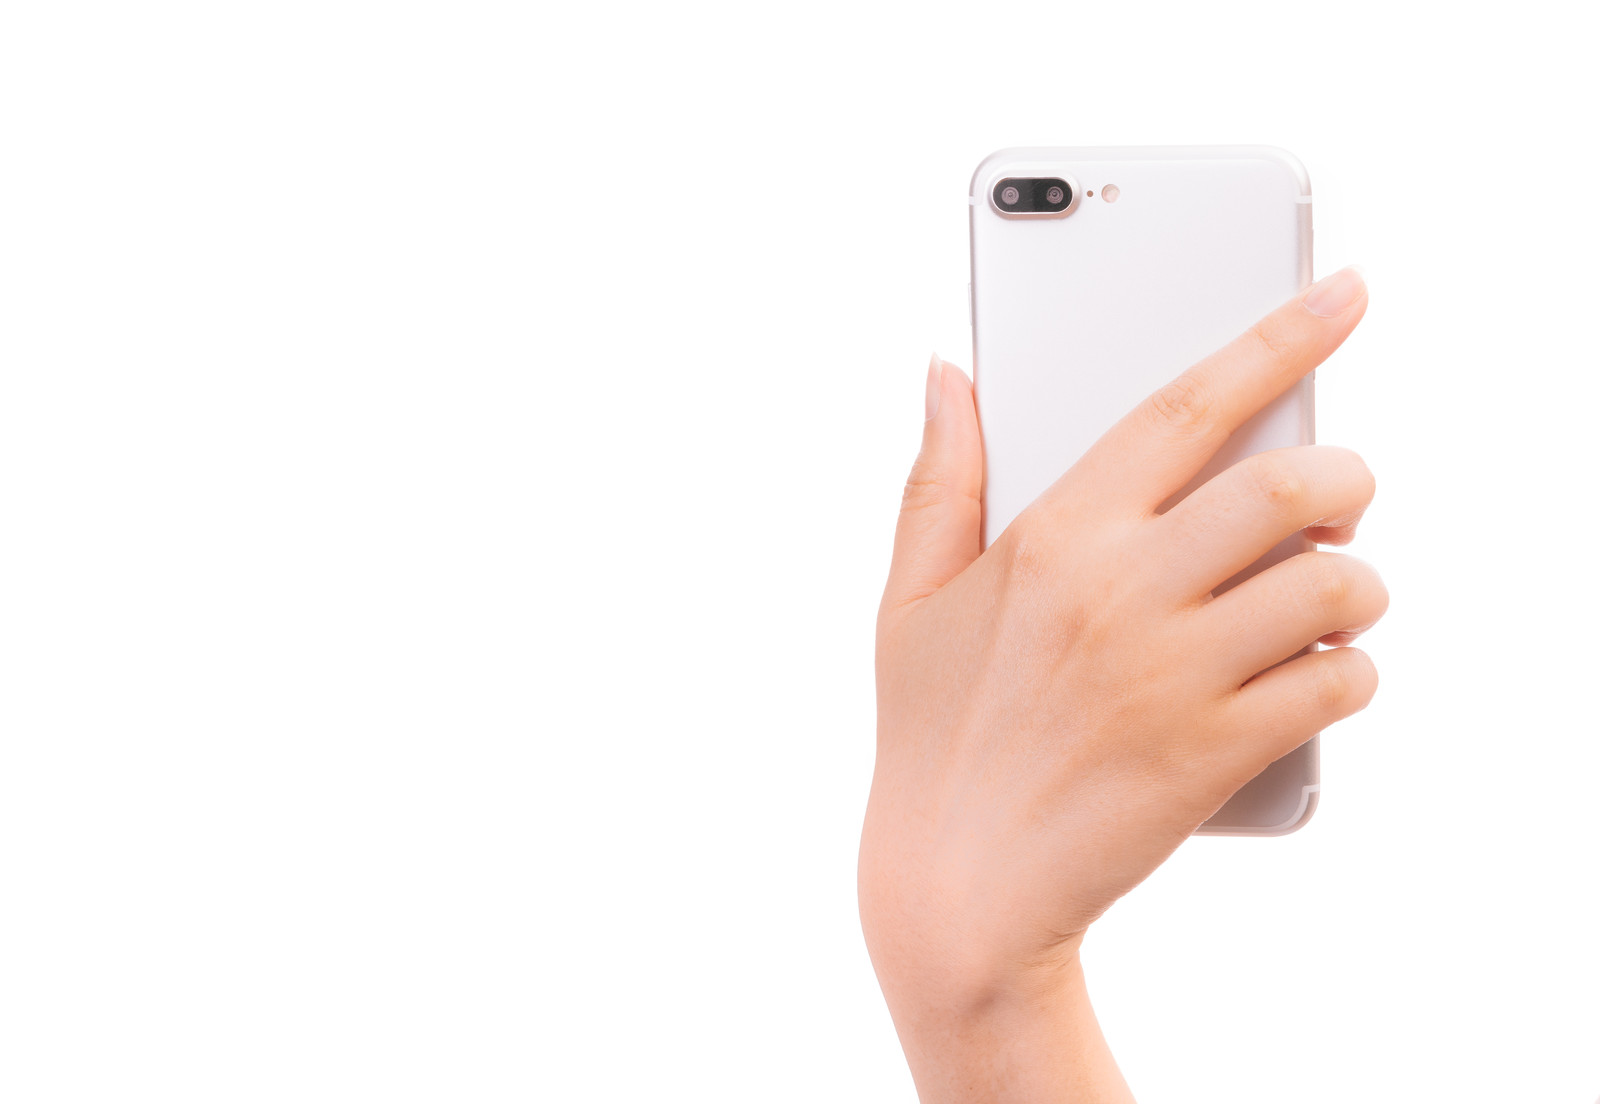 iPhoneのカメラはシャッター音が大きすぎる!無音カメラは画質が悪い!そんな時はこれ